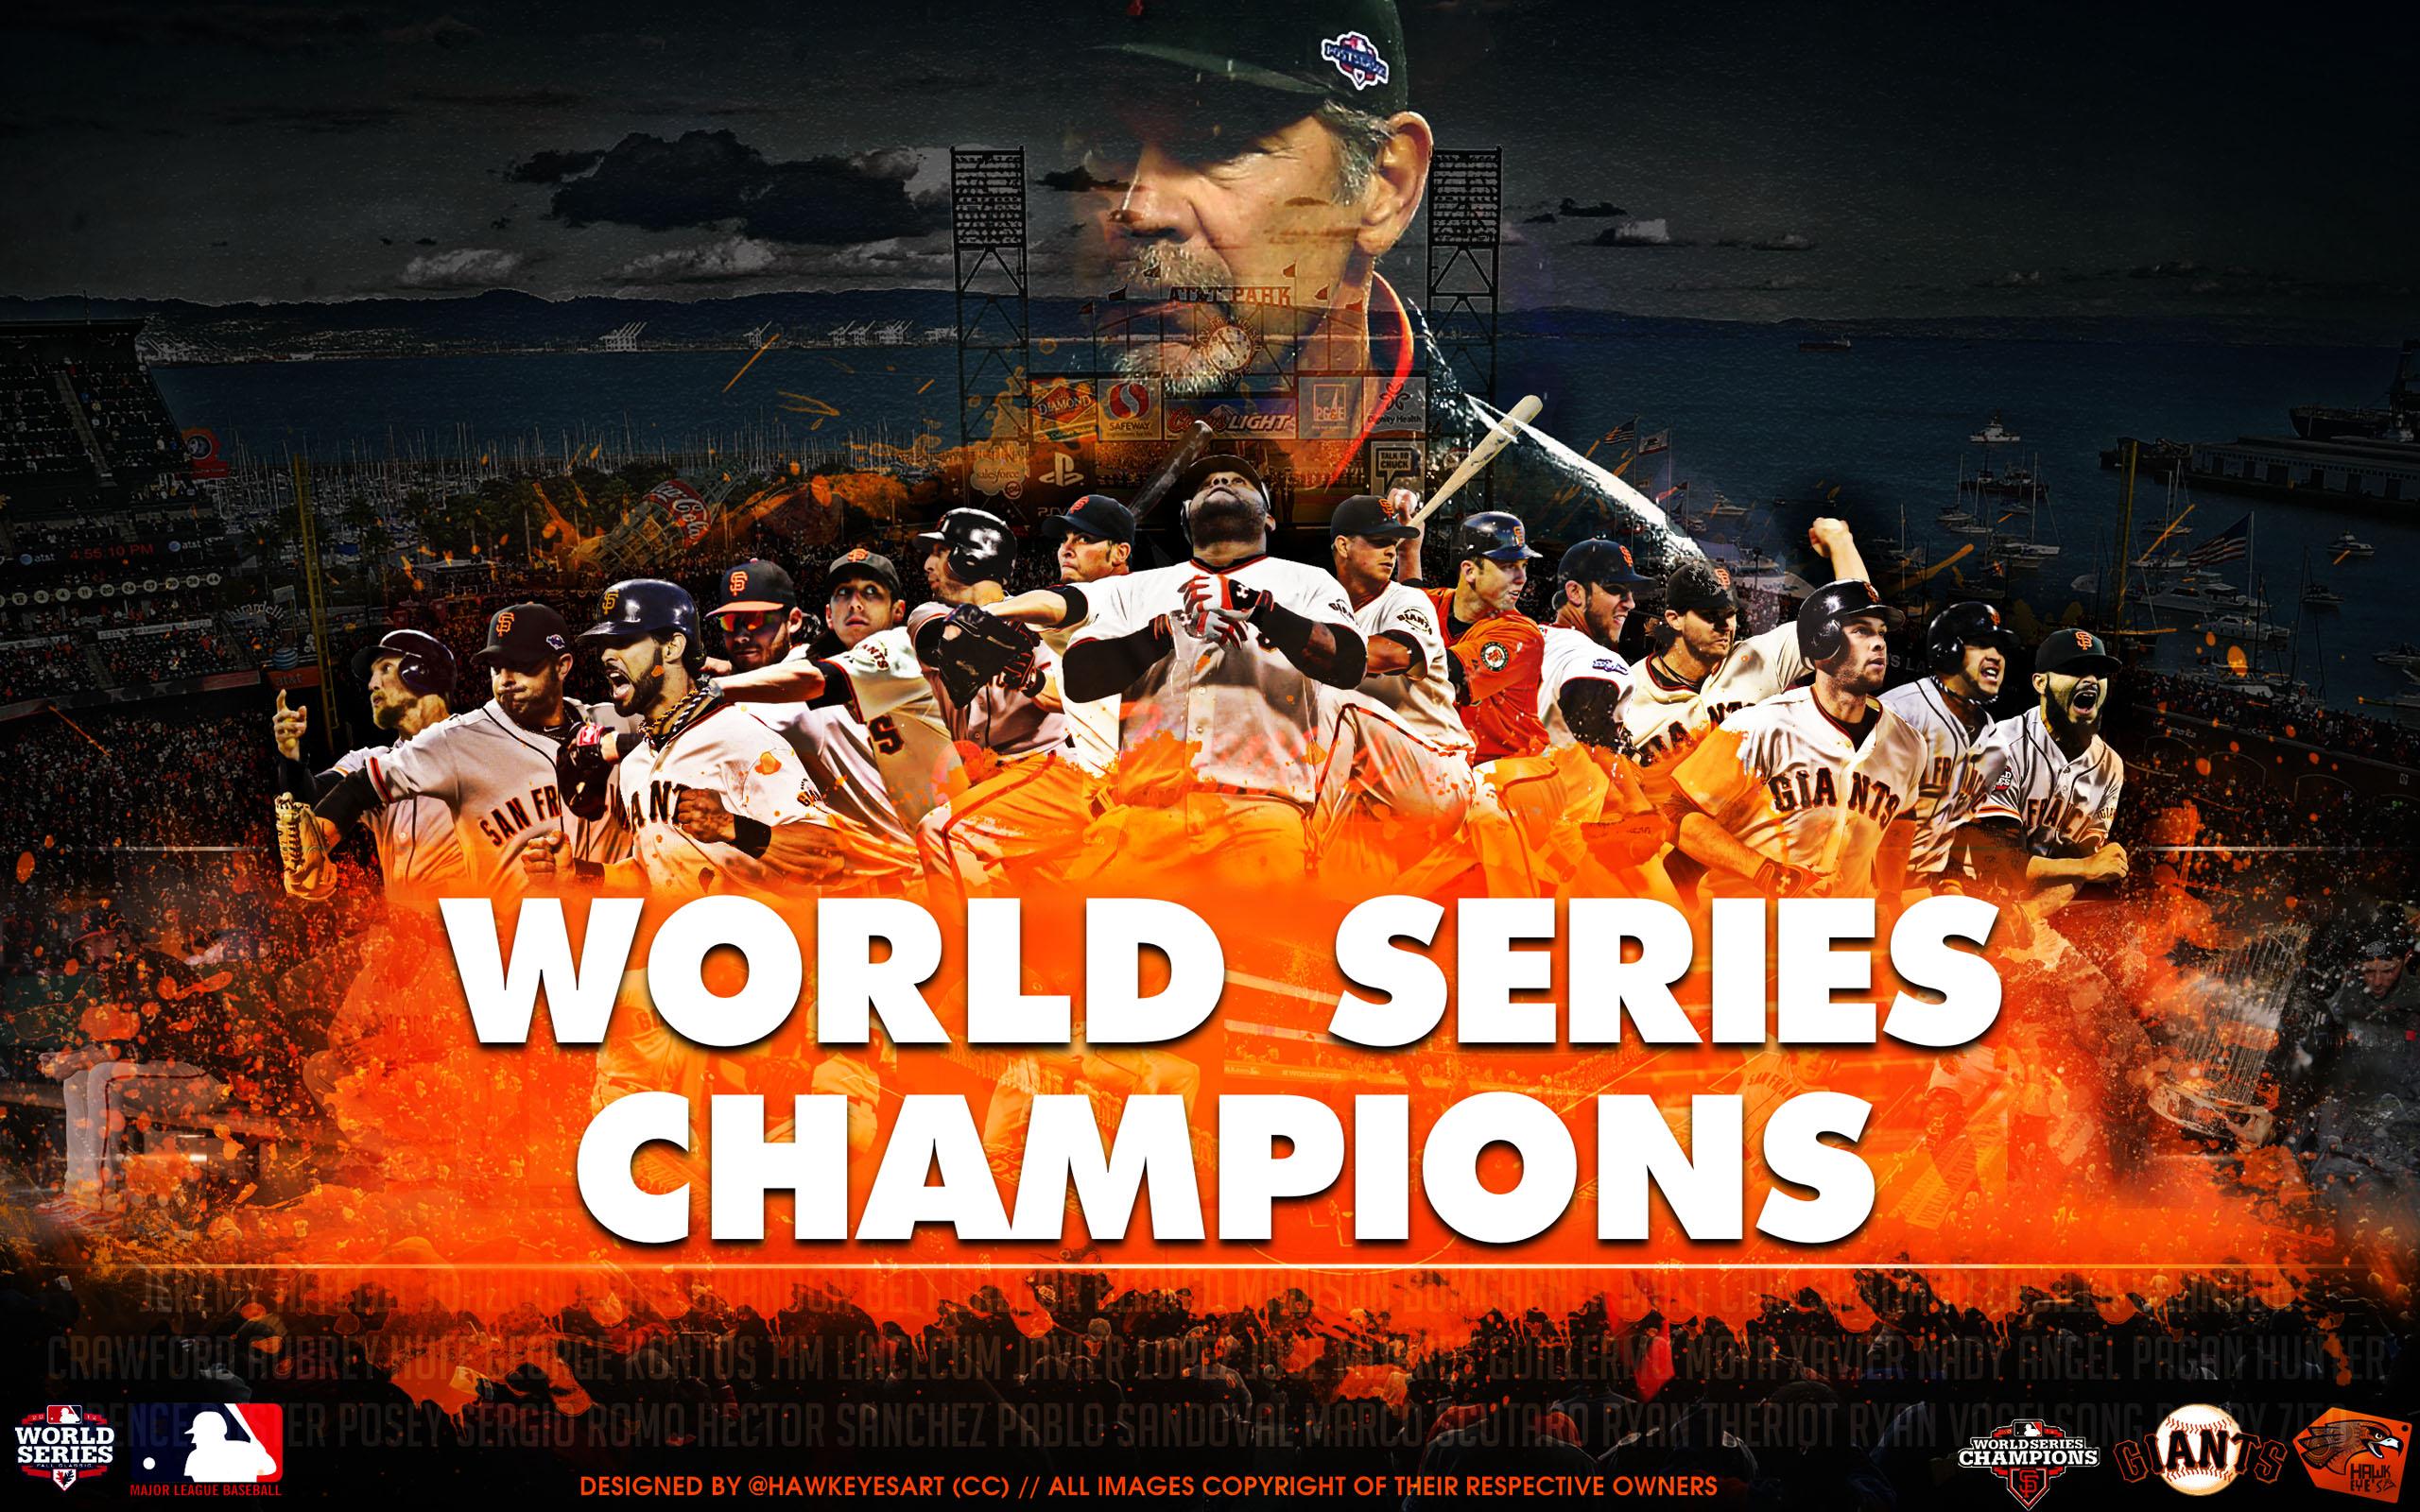 SAN FRANCISCO GIANTS mlb baseball 32 wallpaper 2560x1600